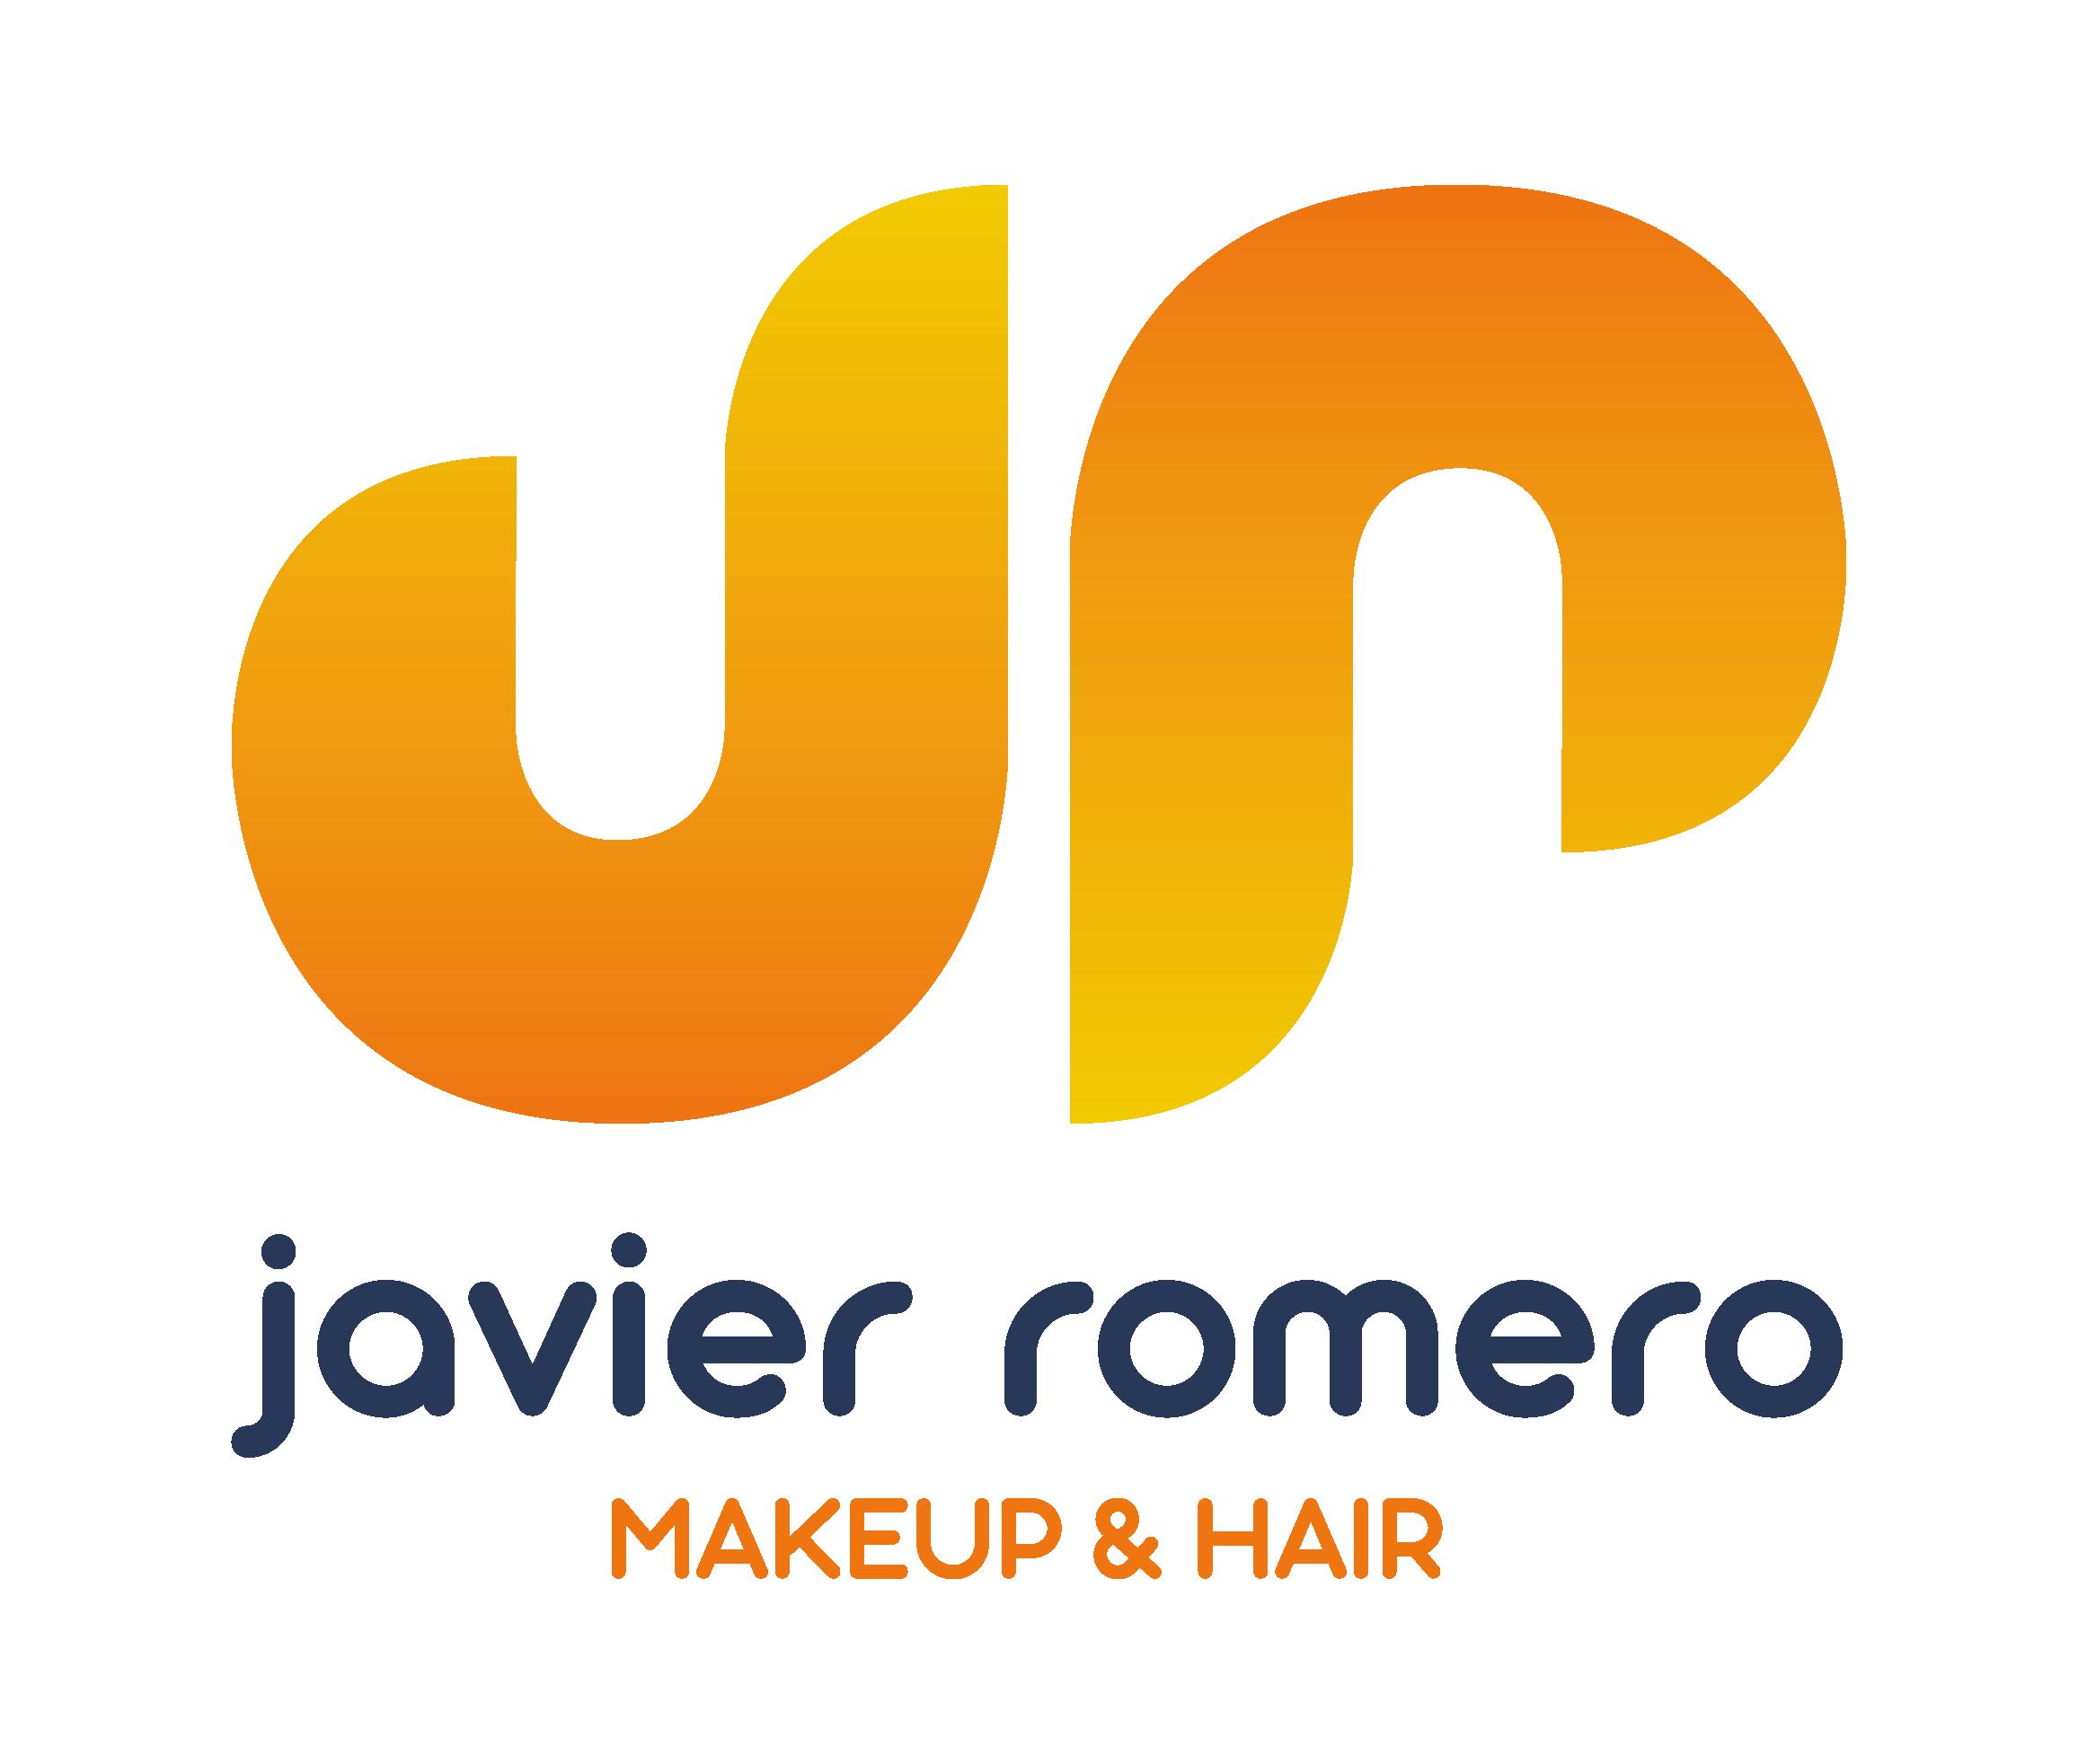 Javier Romero Make up & hairdresser - Inicio